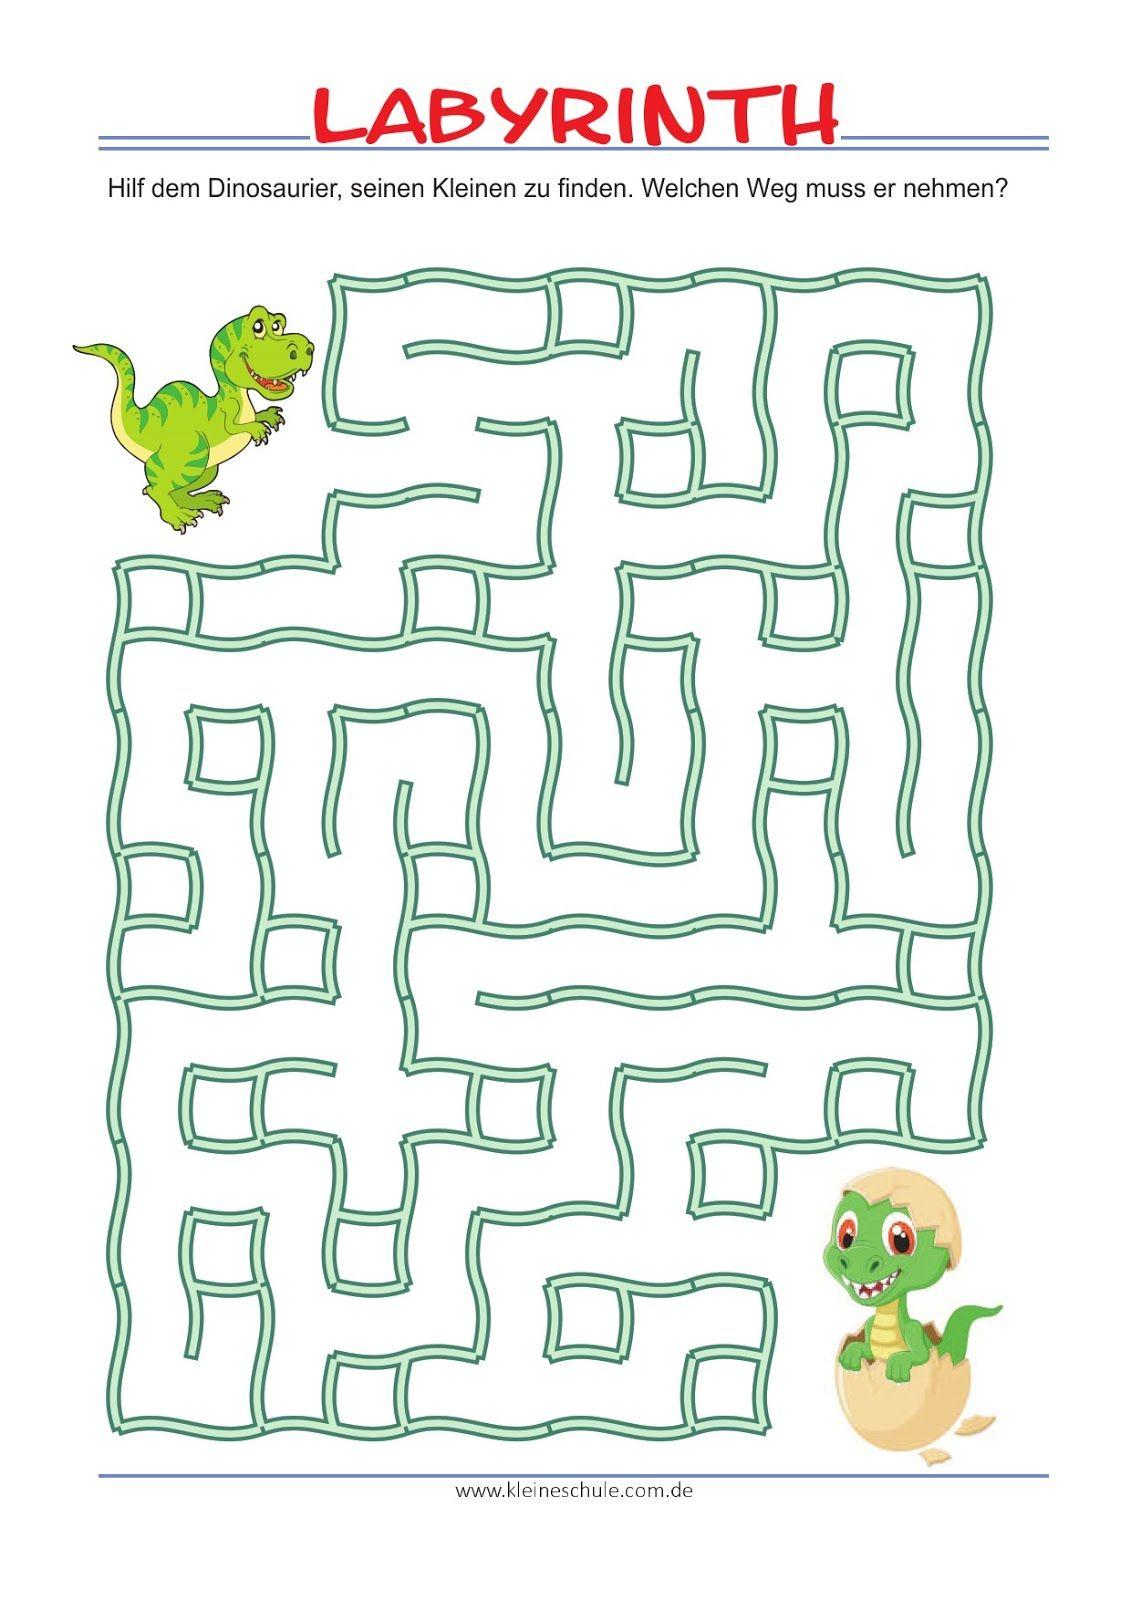 Labyrinth Maze Design For Kids Ideas